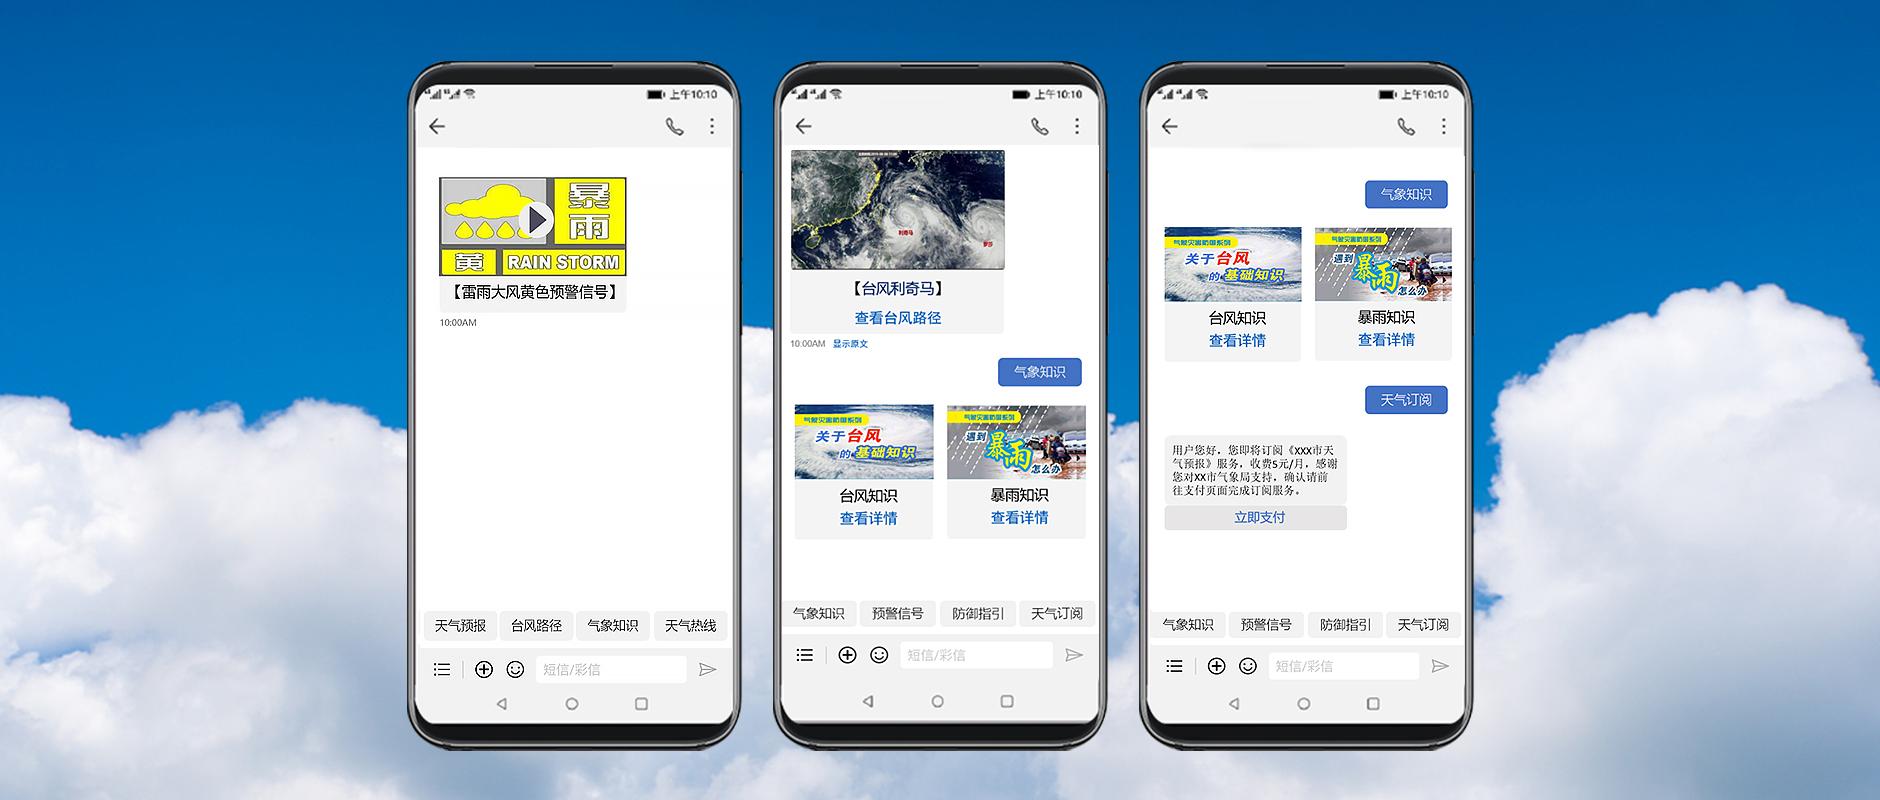 5G消息让广西气象信息更智慧, 中智政源协同广西首单5G消息计费项目成功拓展